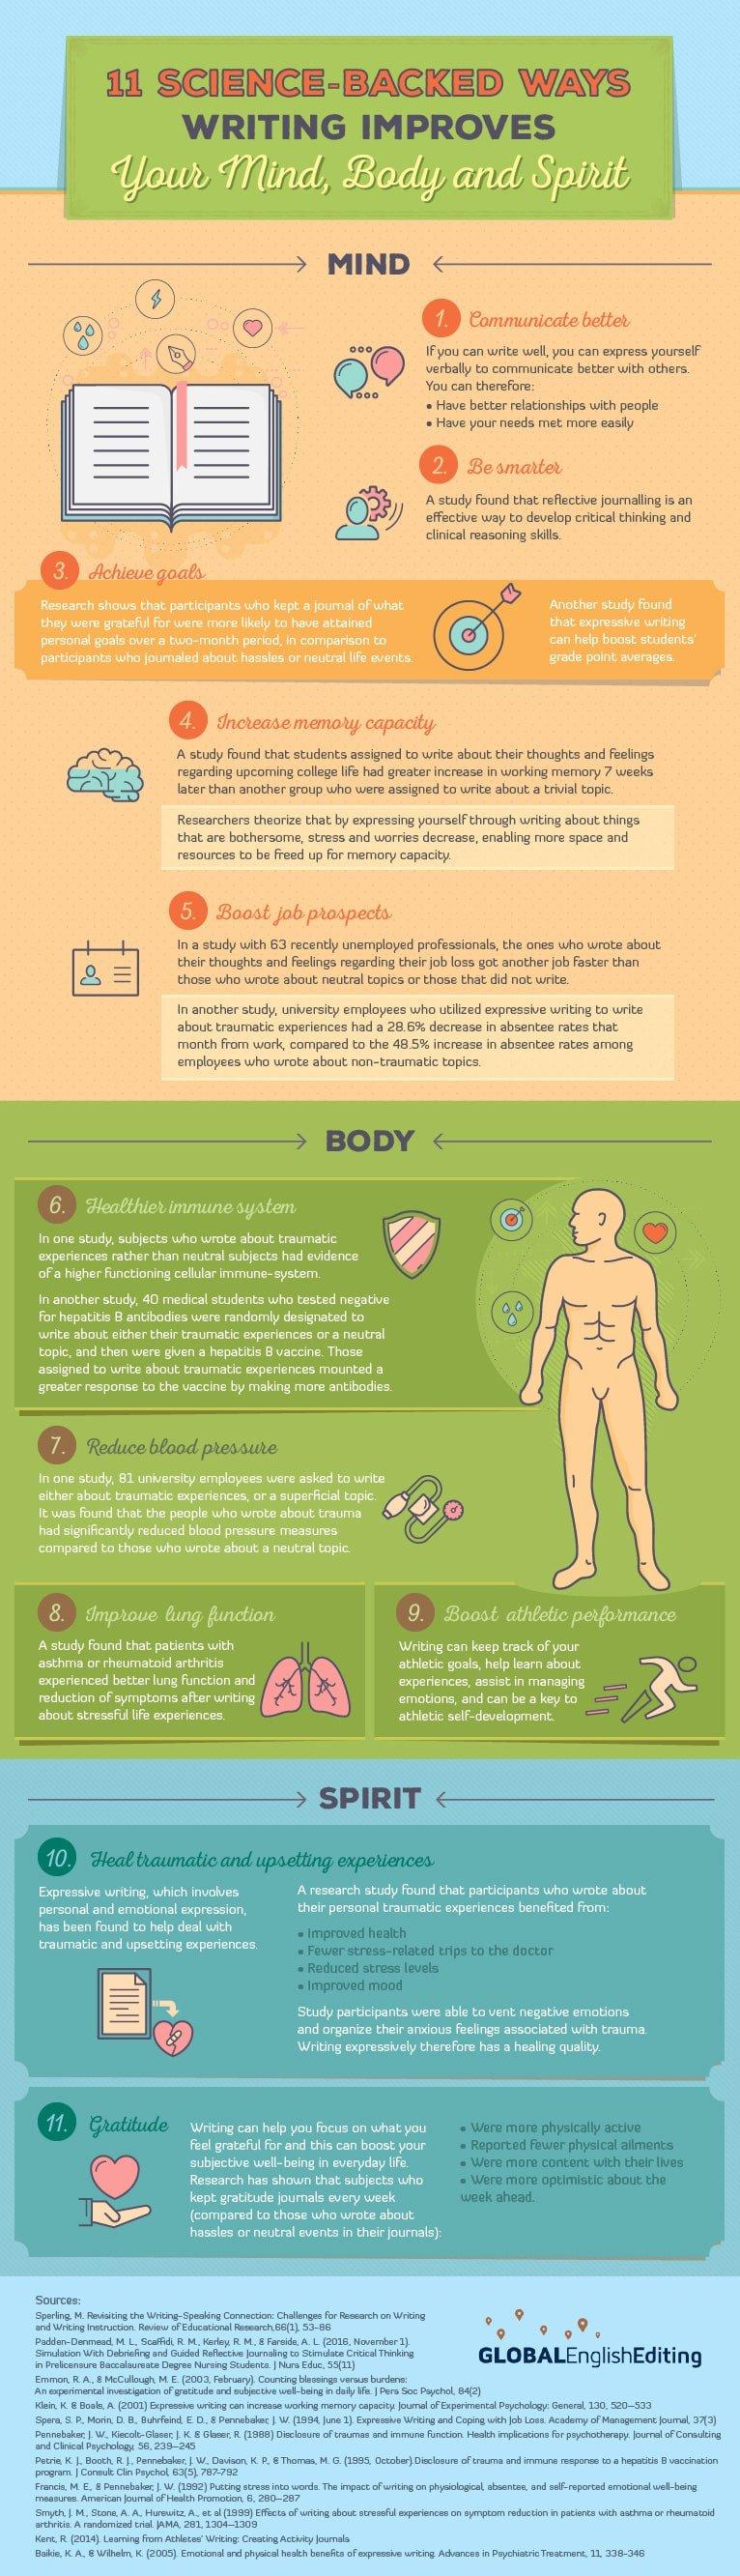 writing benefits infographic